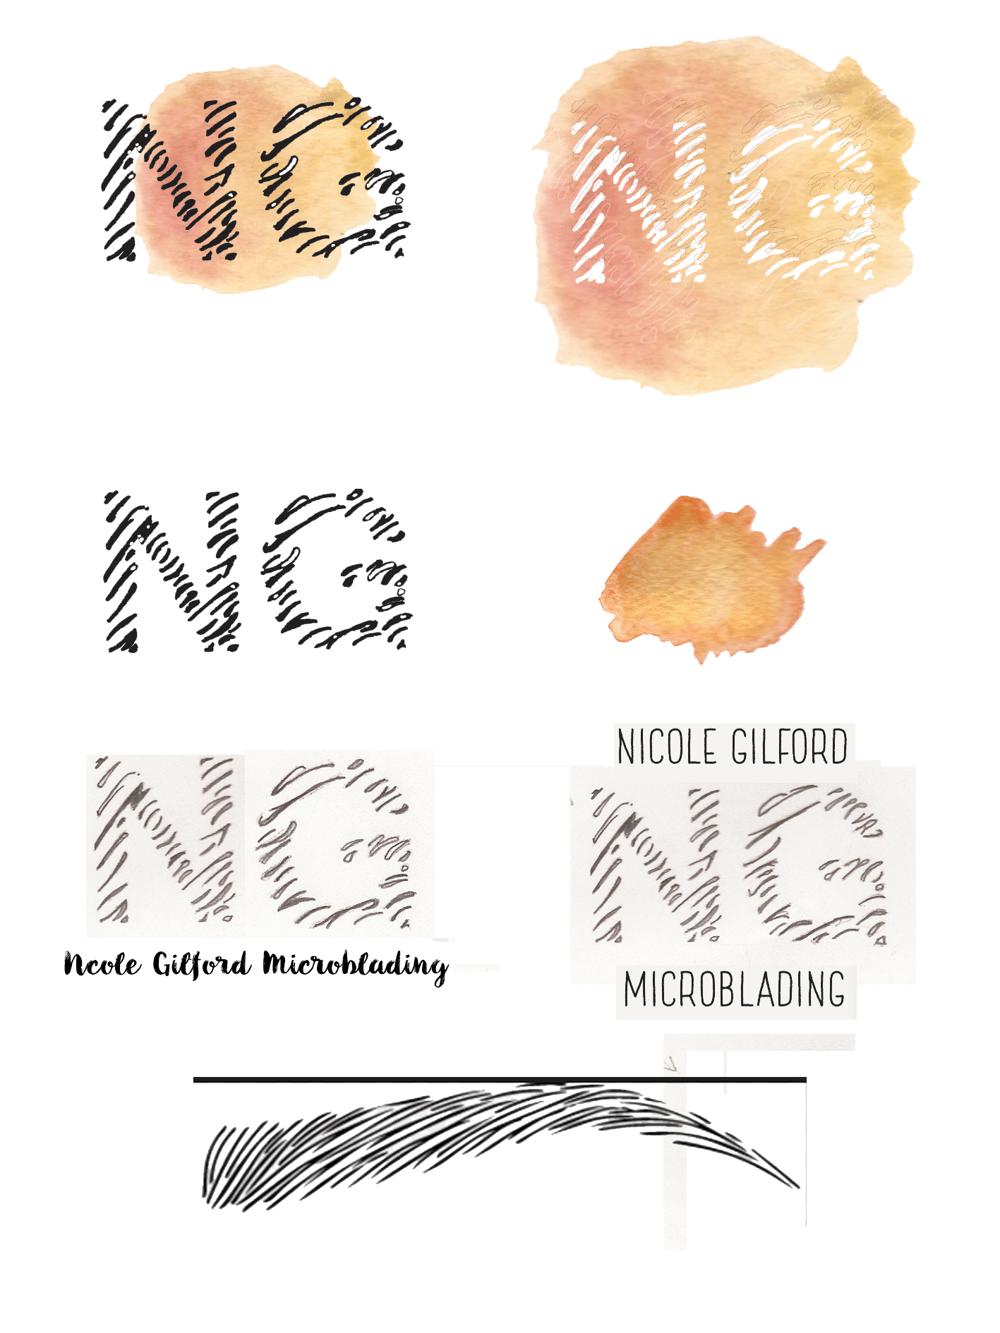 Nicole Gilford; Micro-blading brow artist - image 2 - student project